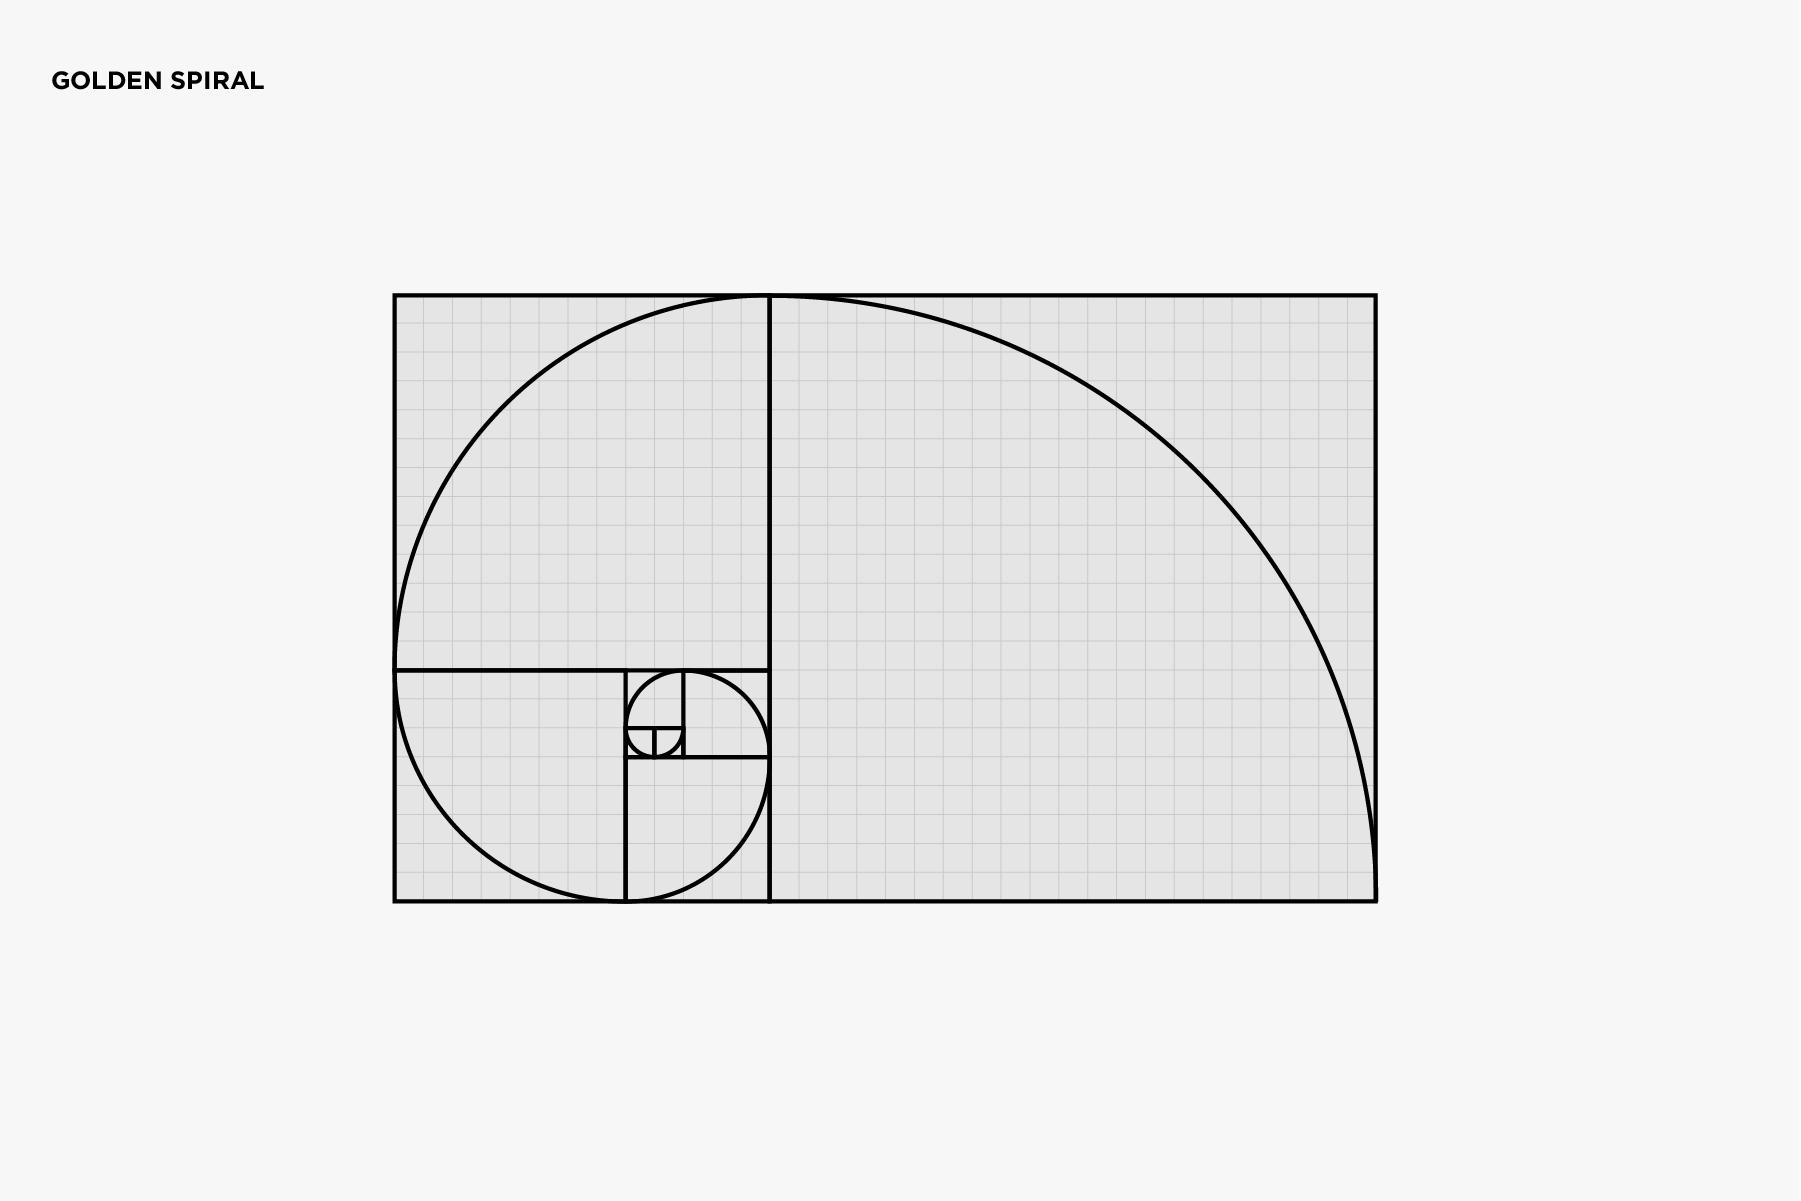 Using the golden ratio in logo design